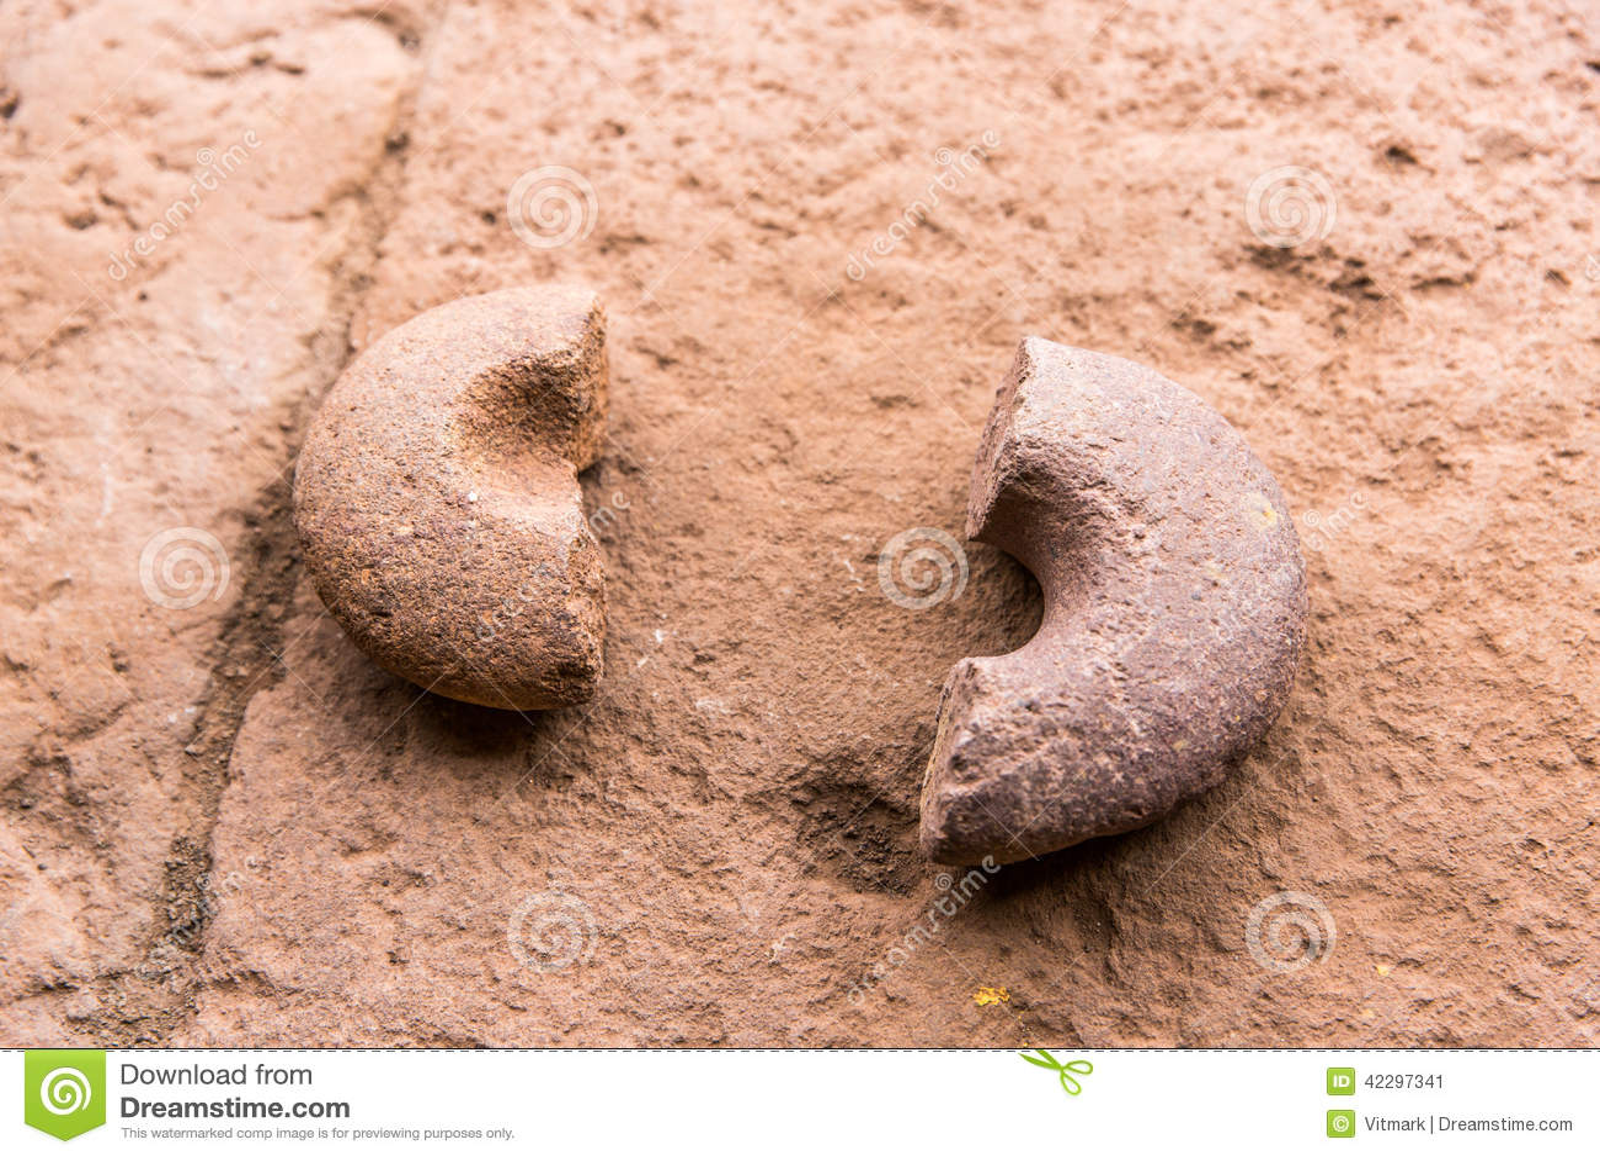 Peru ancient aztec and maya stone sculptures